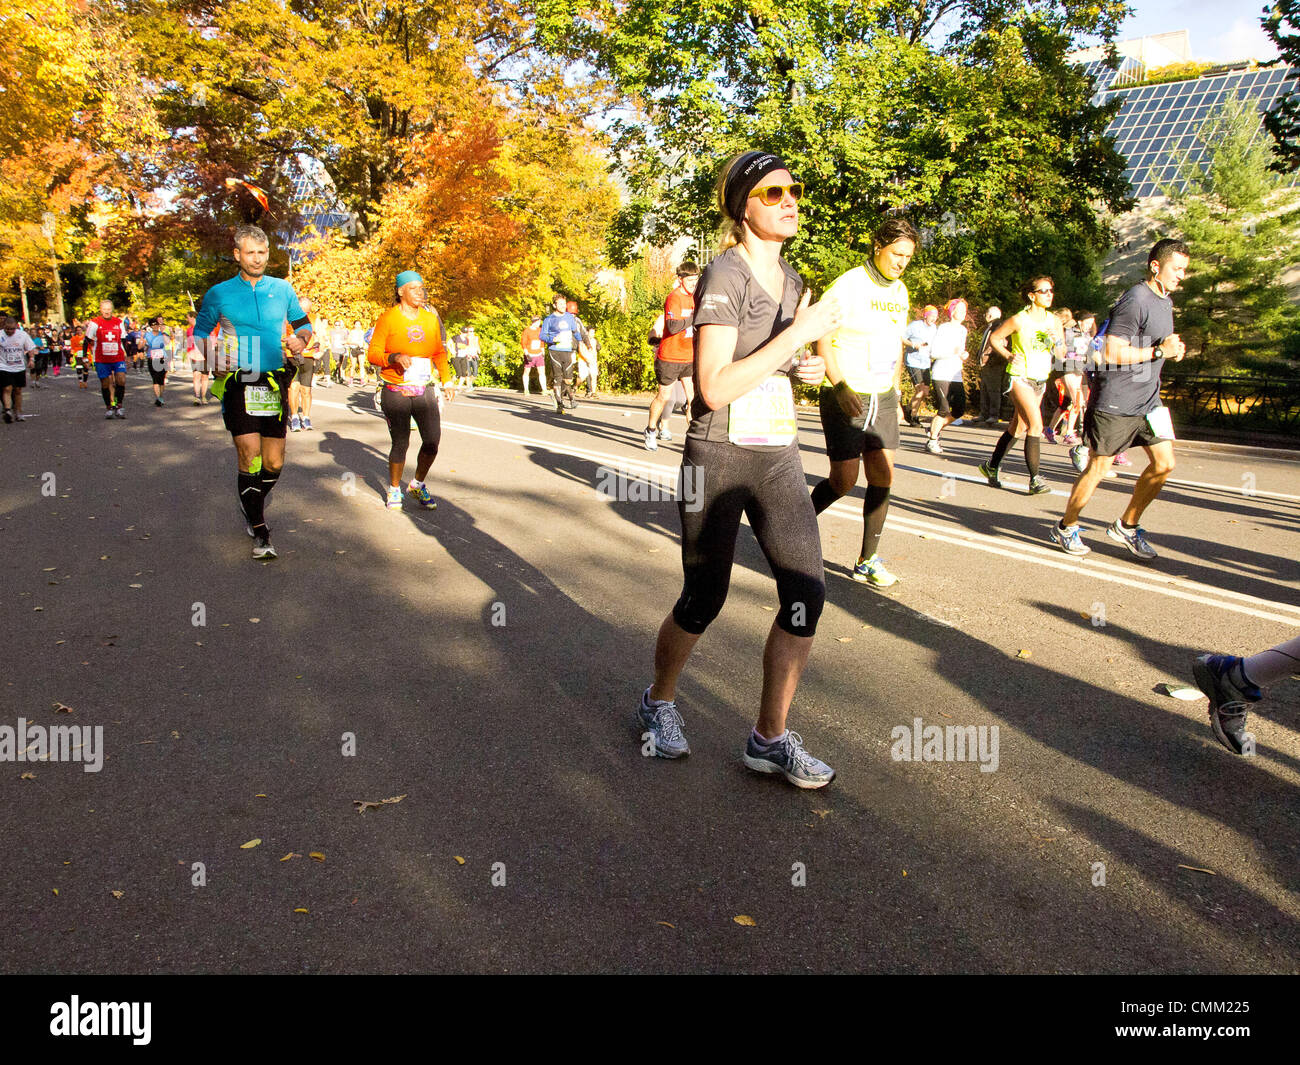 New York, USA. 3 novembre 2013. Marathon de New York 2013. Les coureurs de marathon NYC 3 Novembre 2013 © Frank Photo Stock